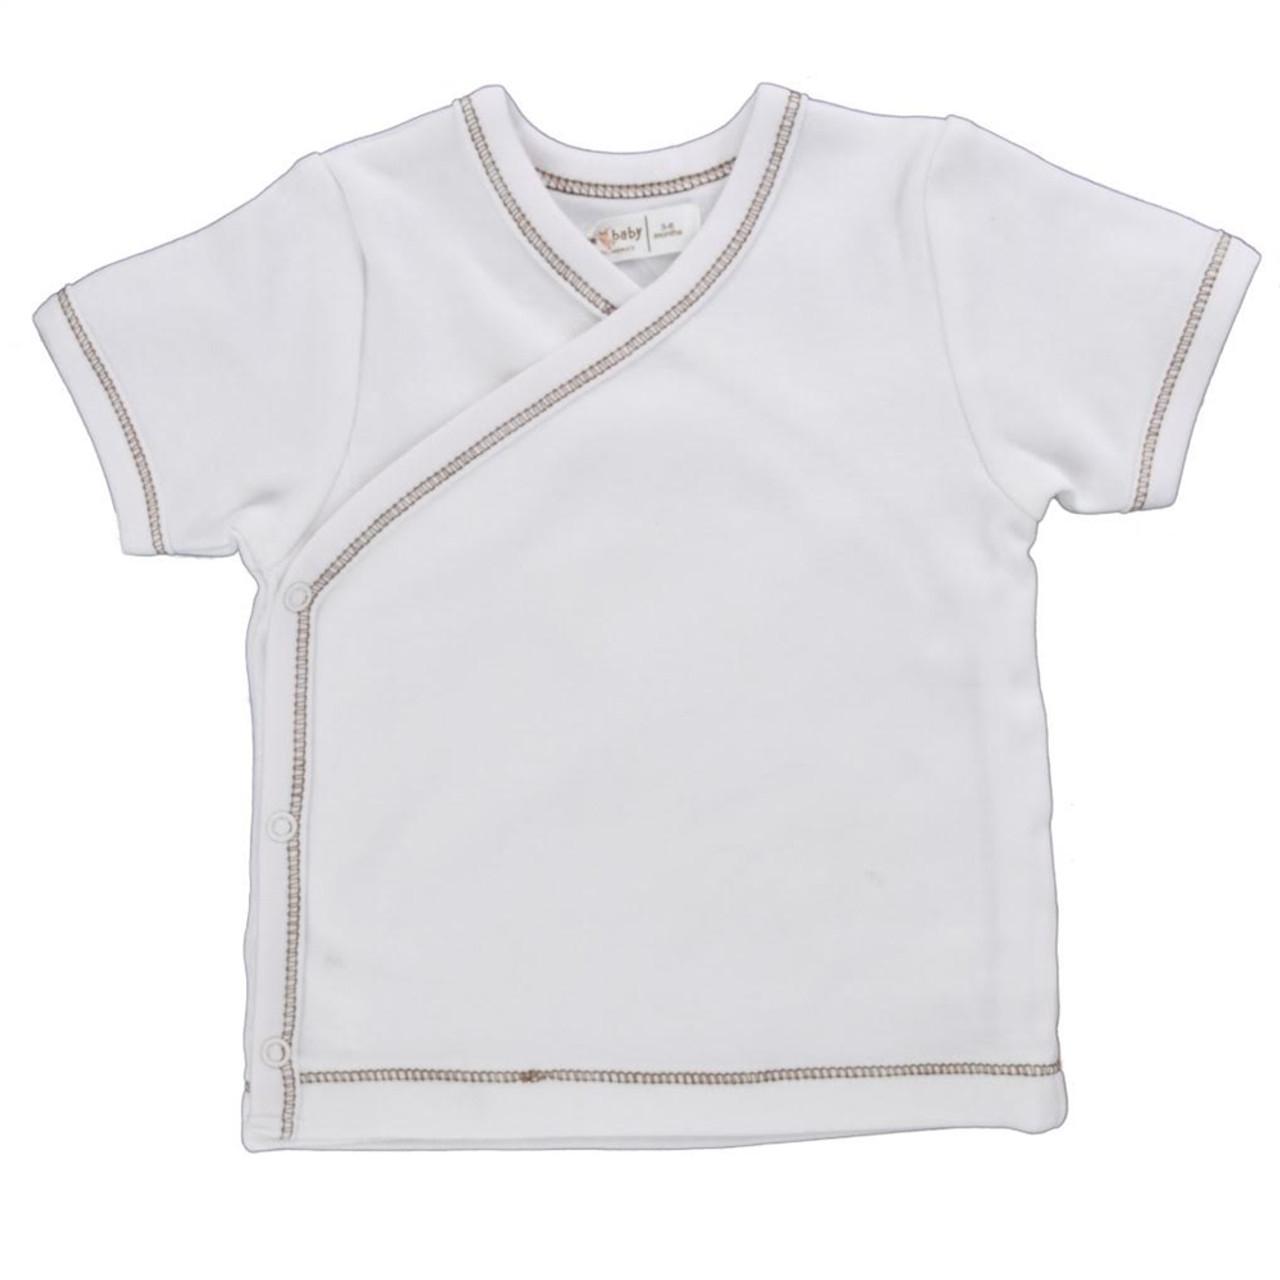 Organic Side Snap Shirt - Brown Stitching - 3-6m